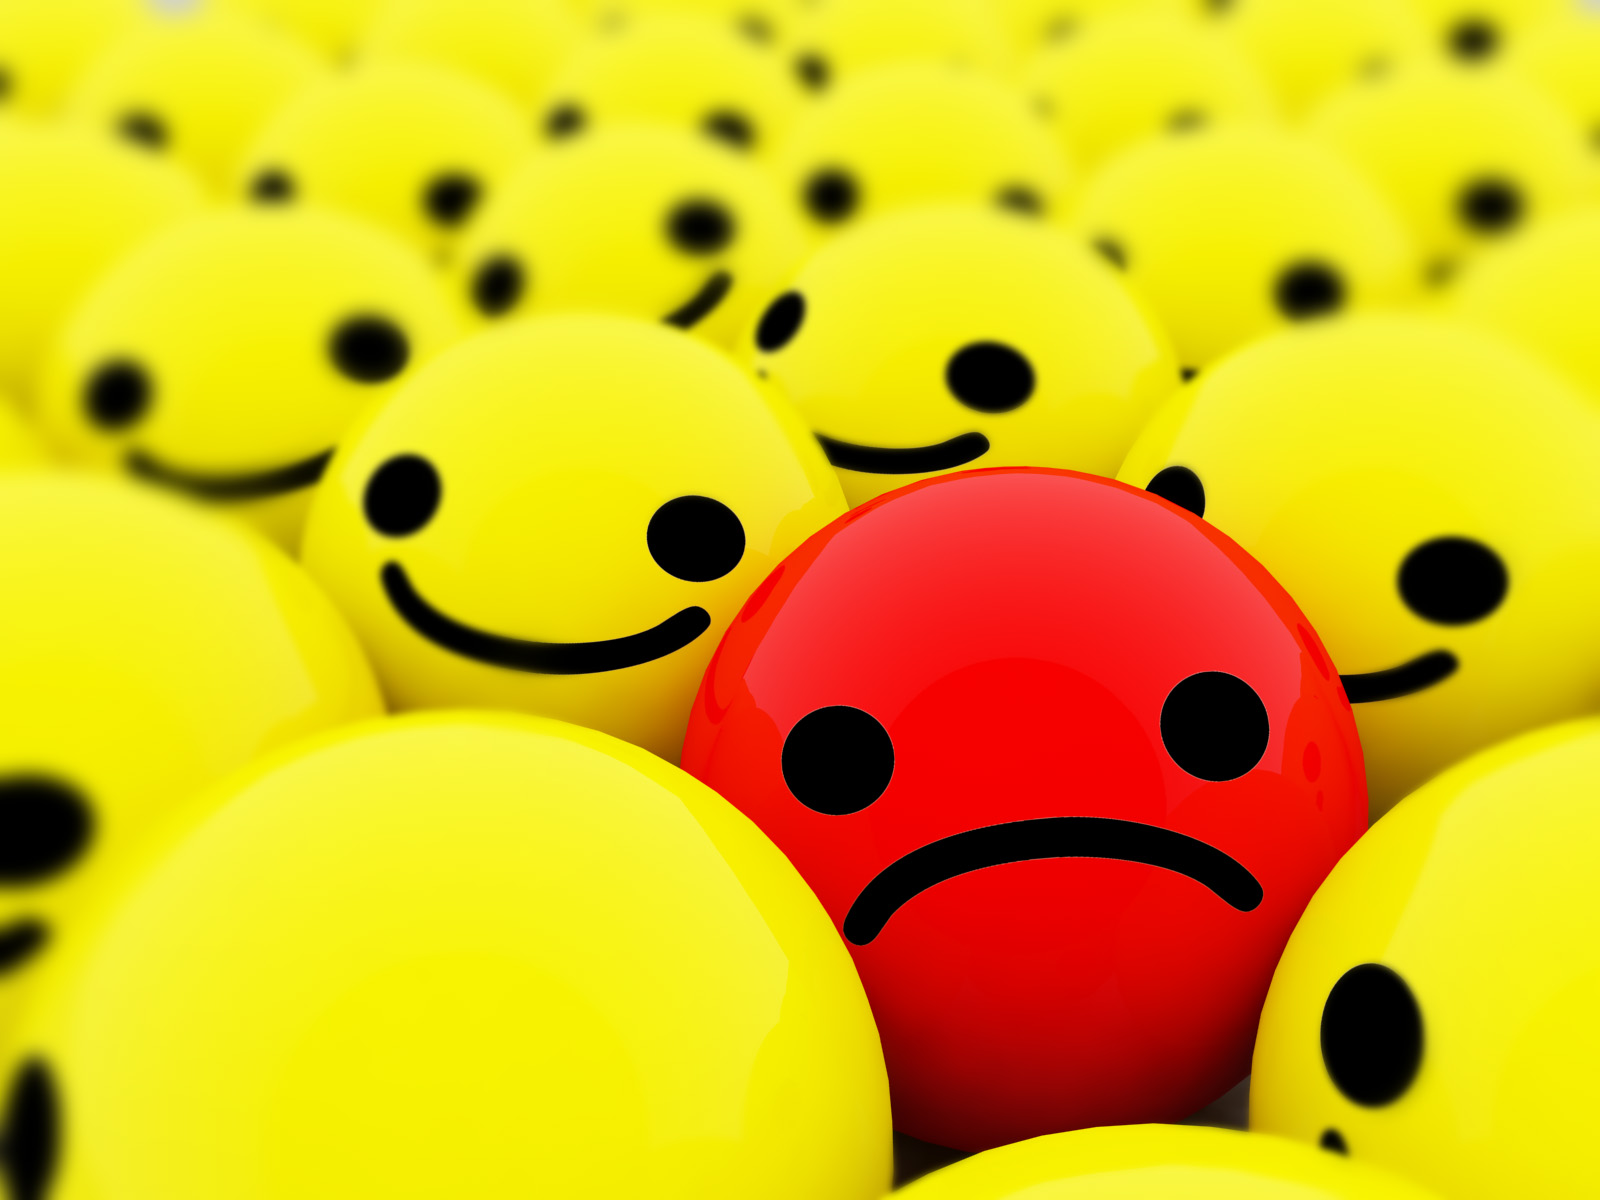 ws_Sad_face_1600x1200